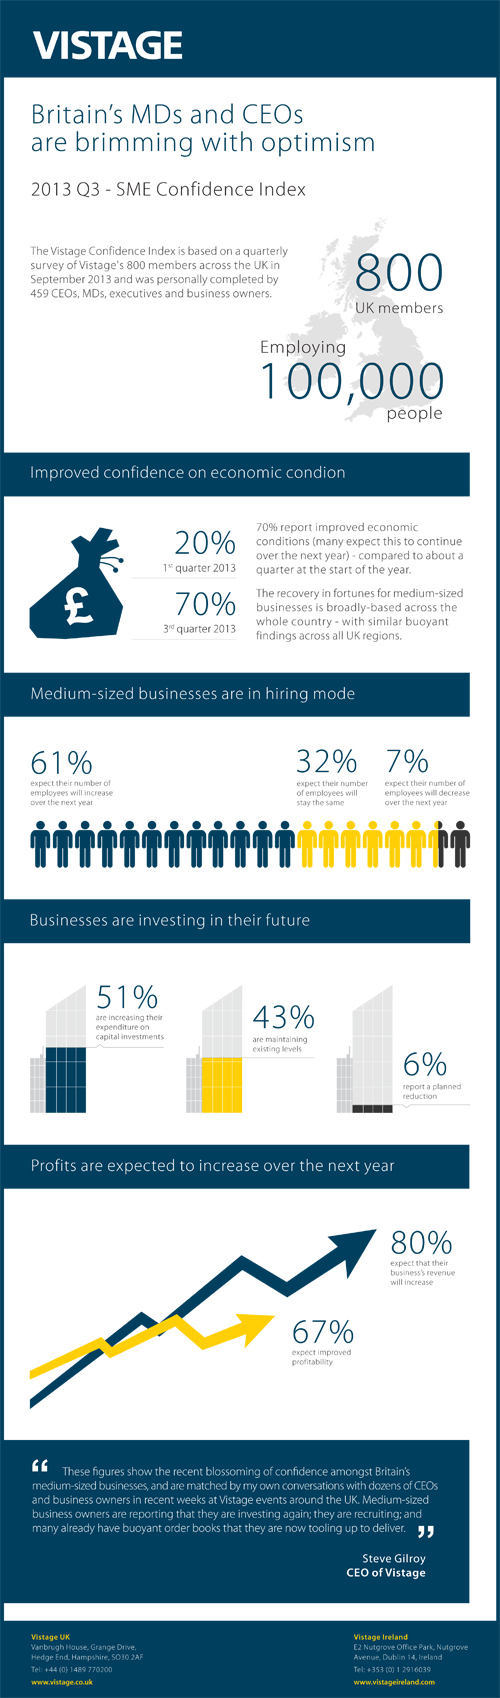 Vistage_SME_Confidence_2013_Q3-_Infographic_500